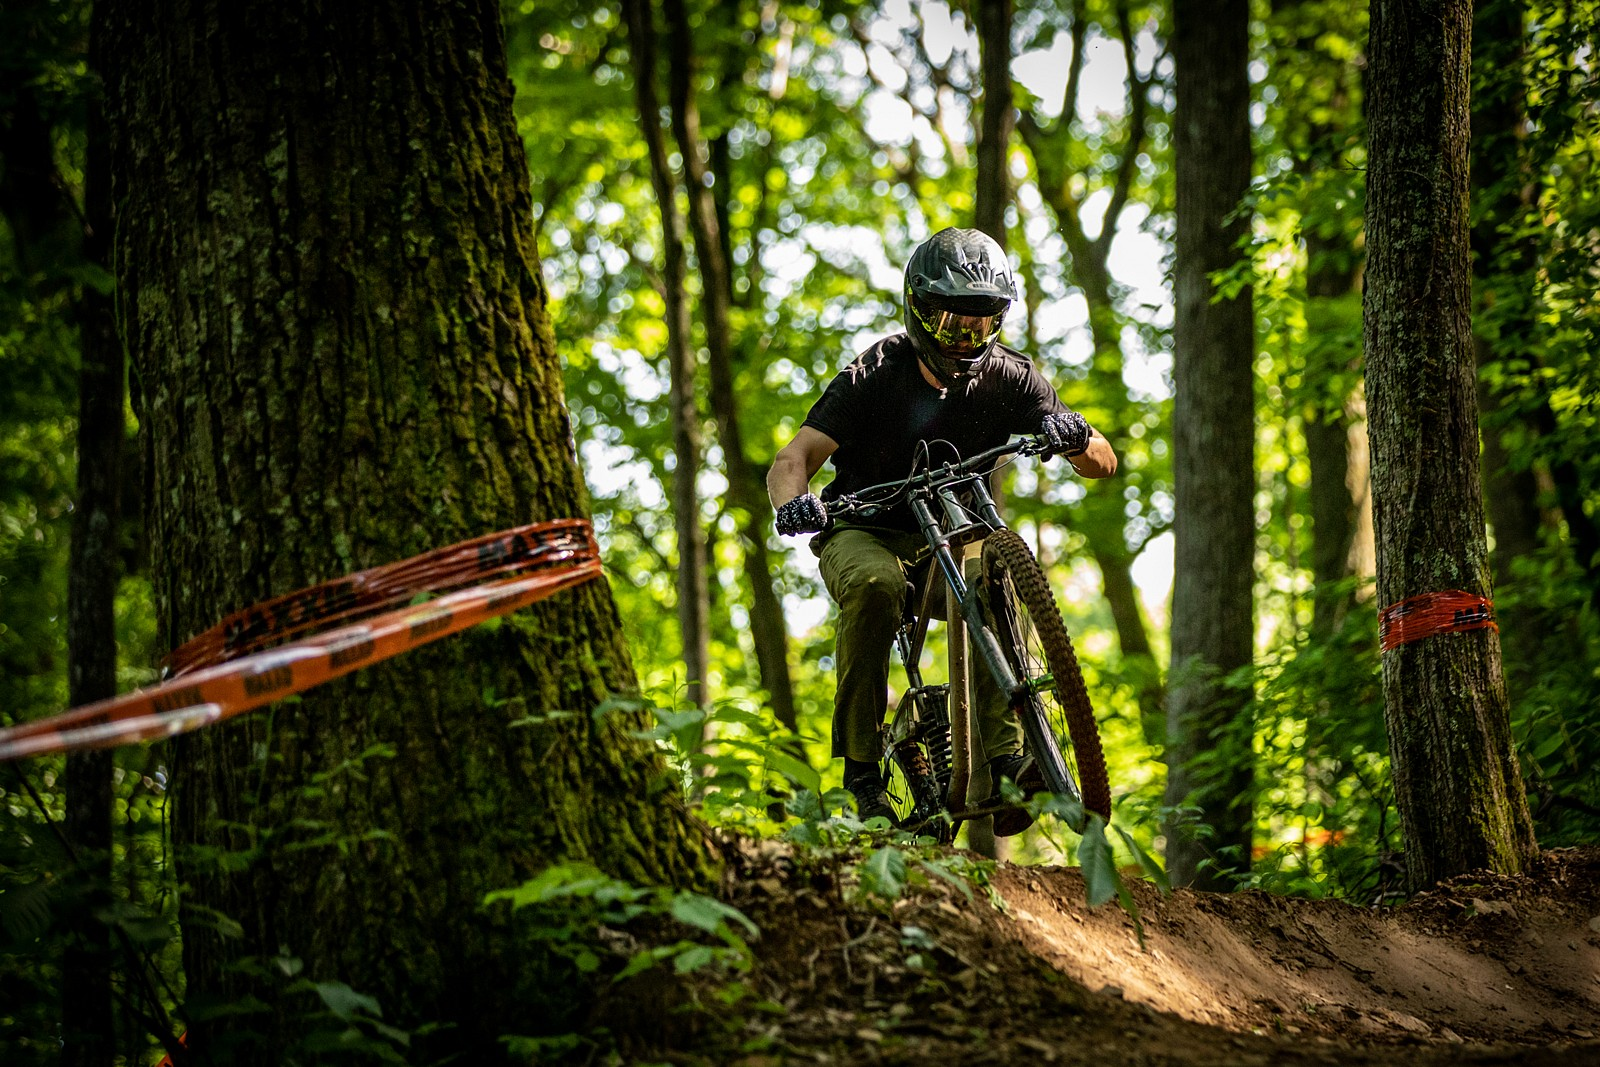 Isak Leivson - JackRice - Mountain Biking Pictures - Vital MTB